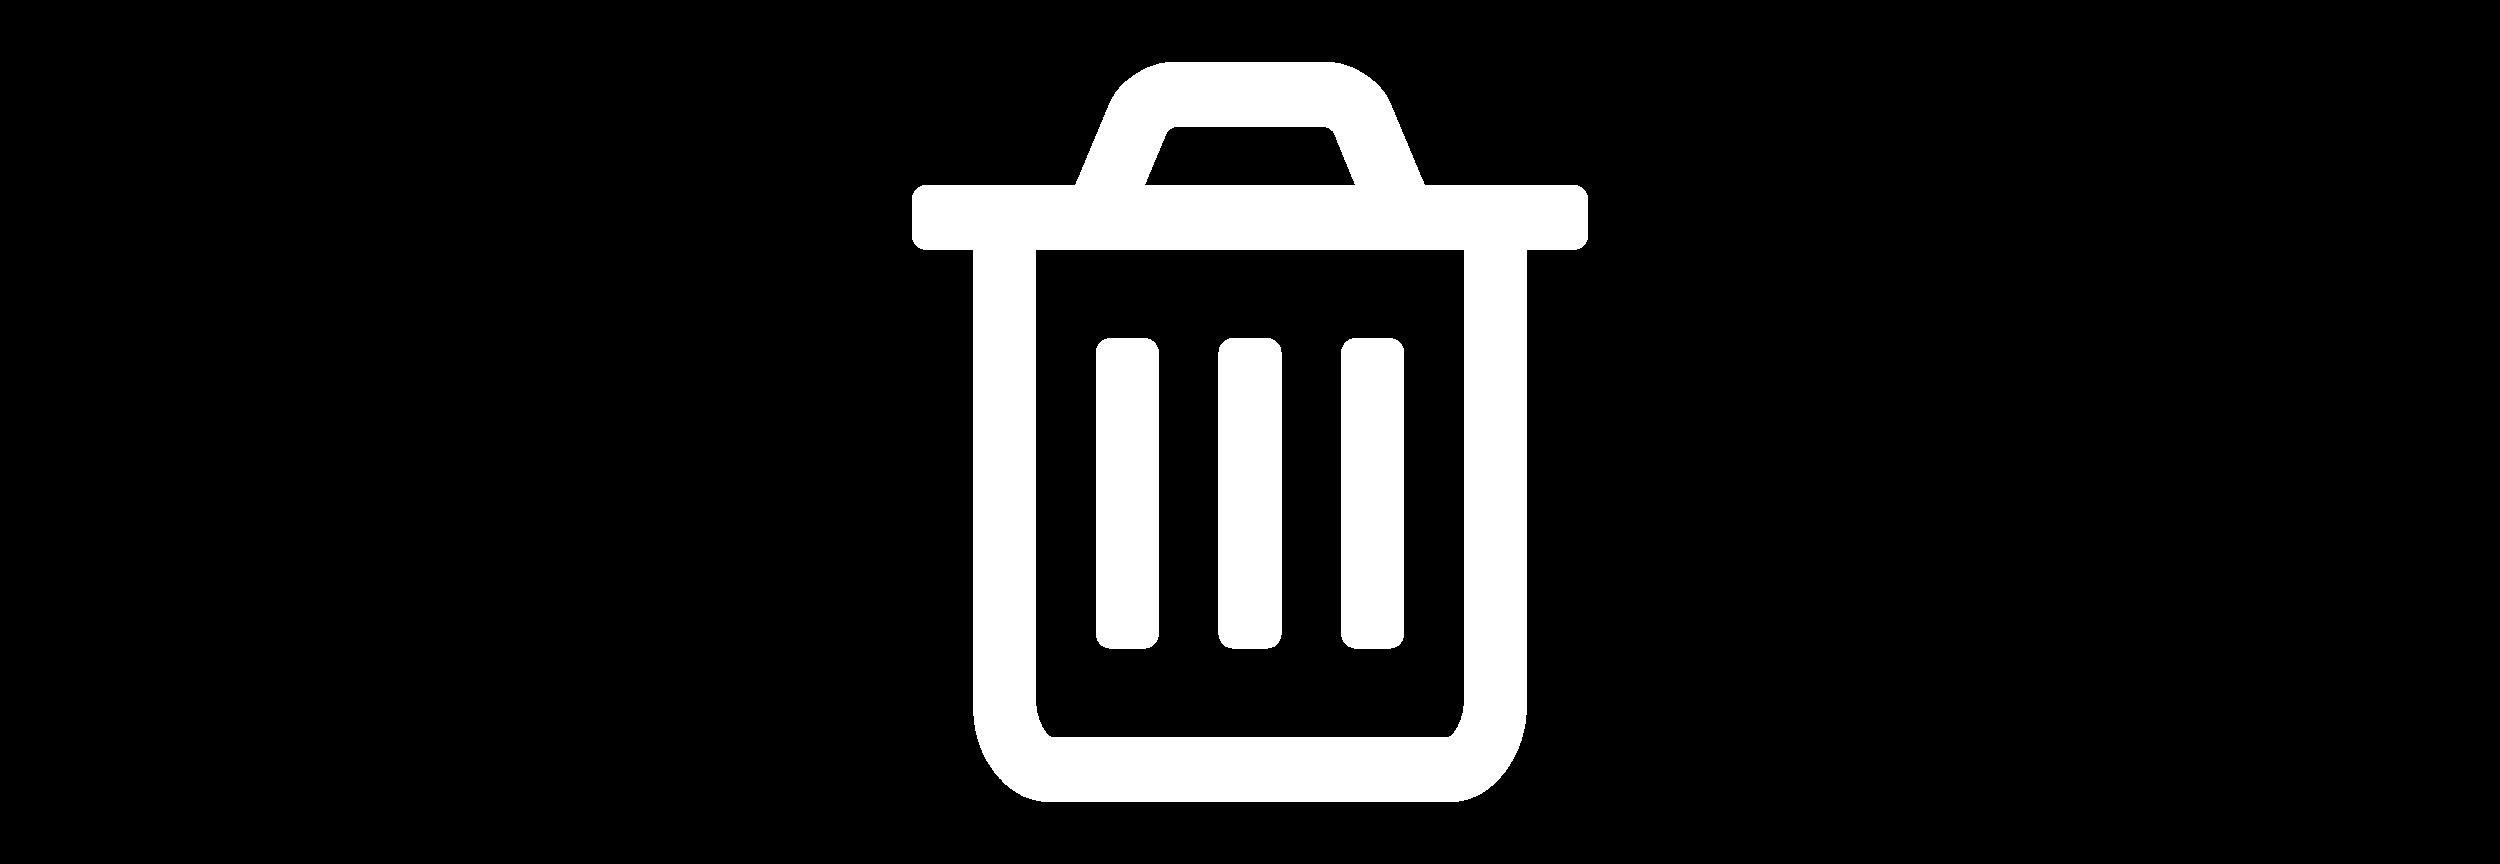 Garbage Can White Icon